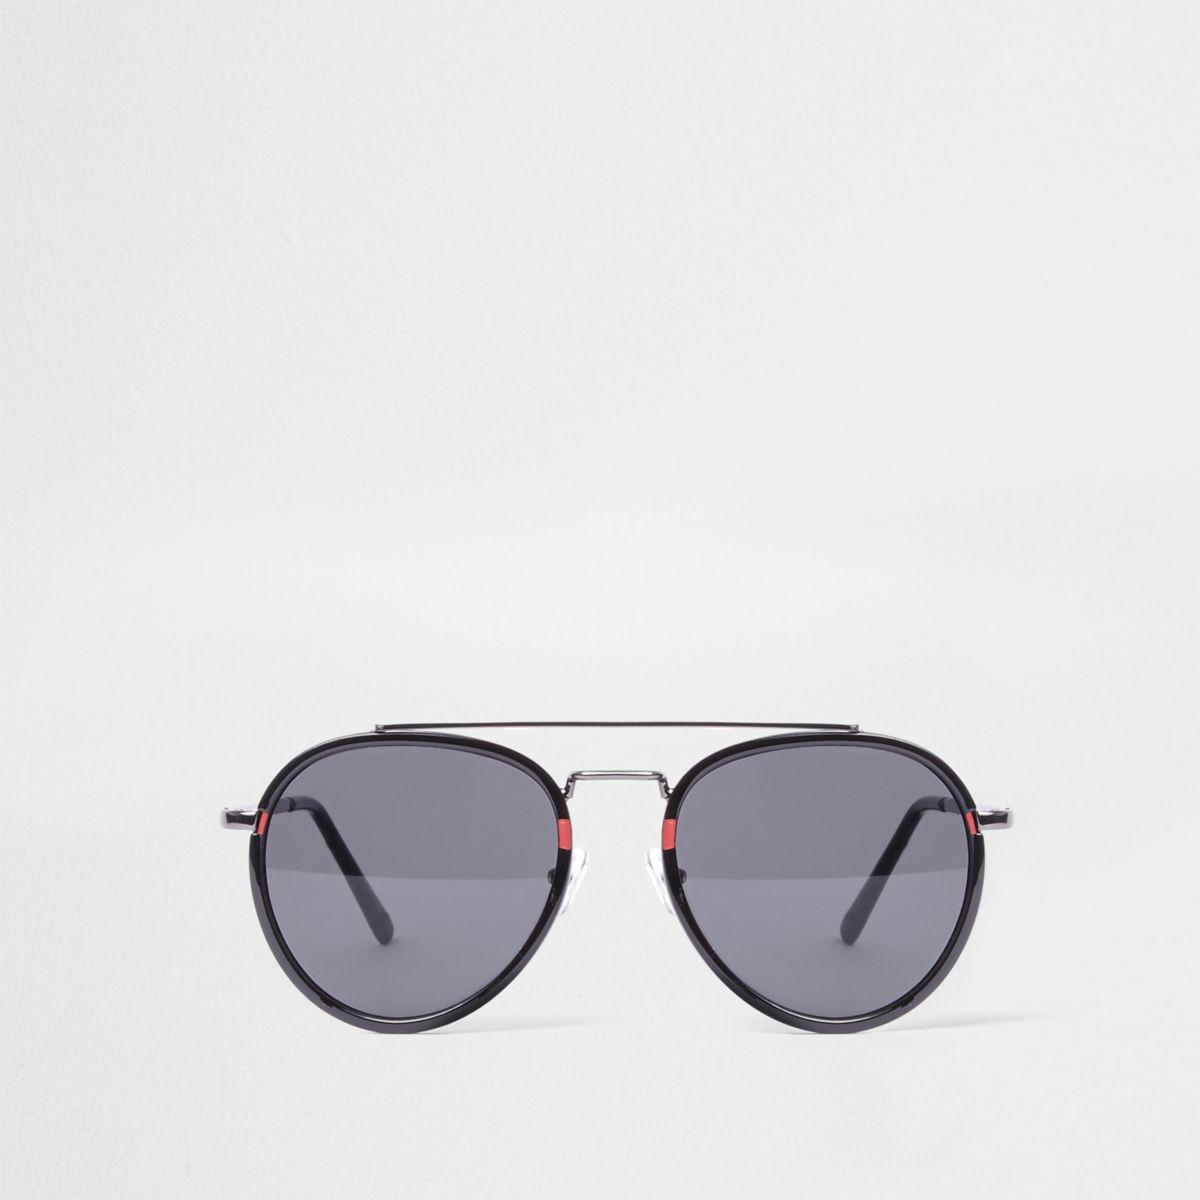 Black smoke lens oval red aviator sunglasses